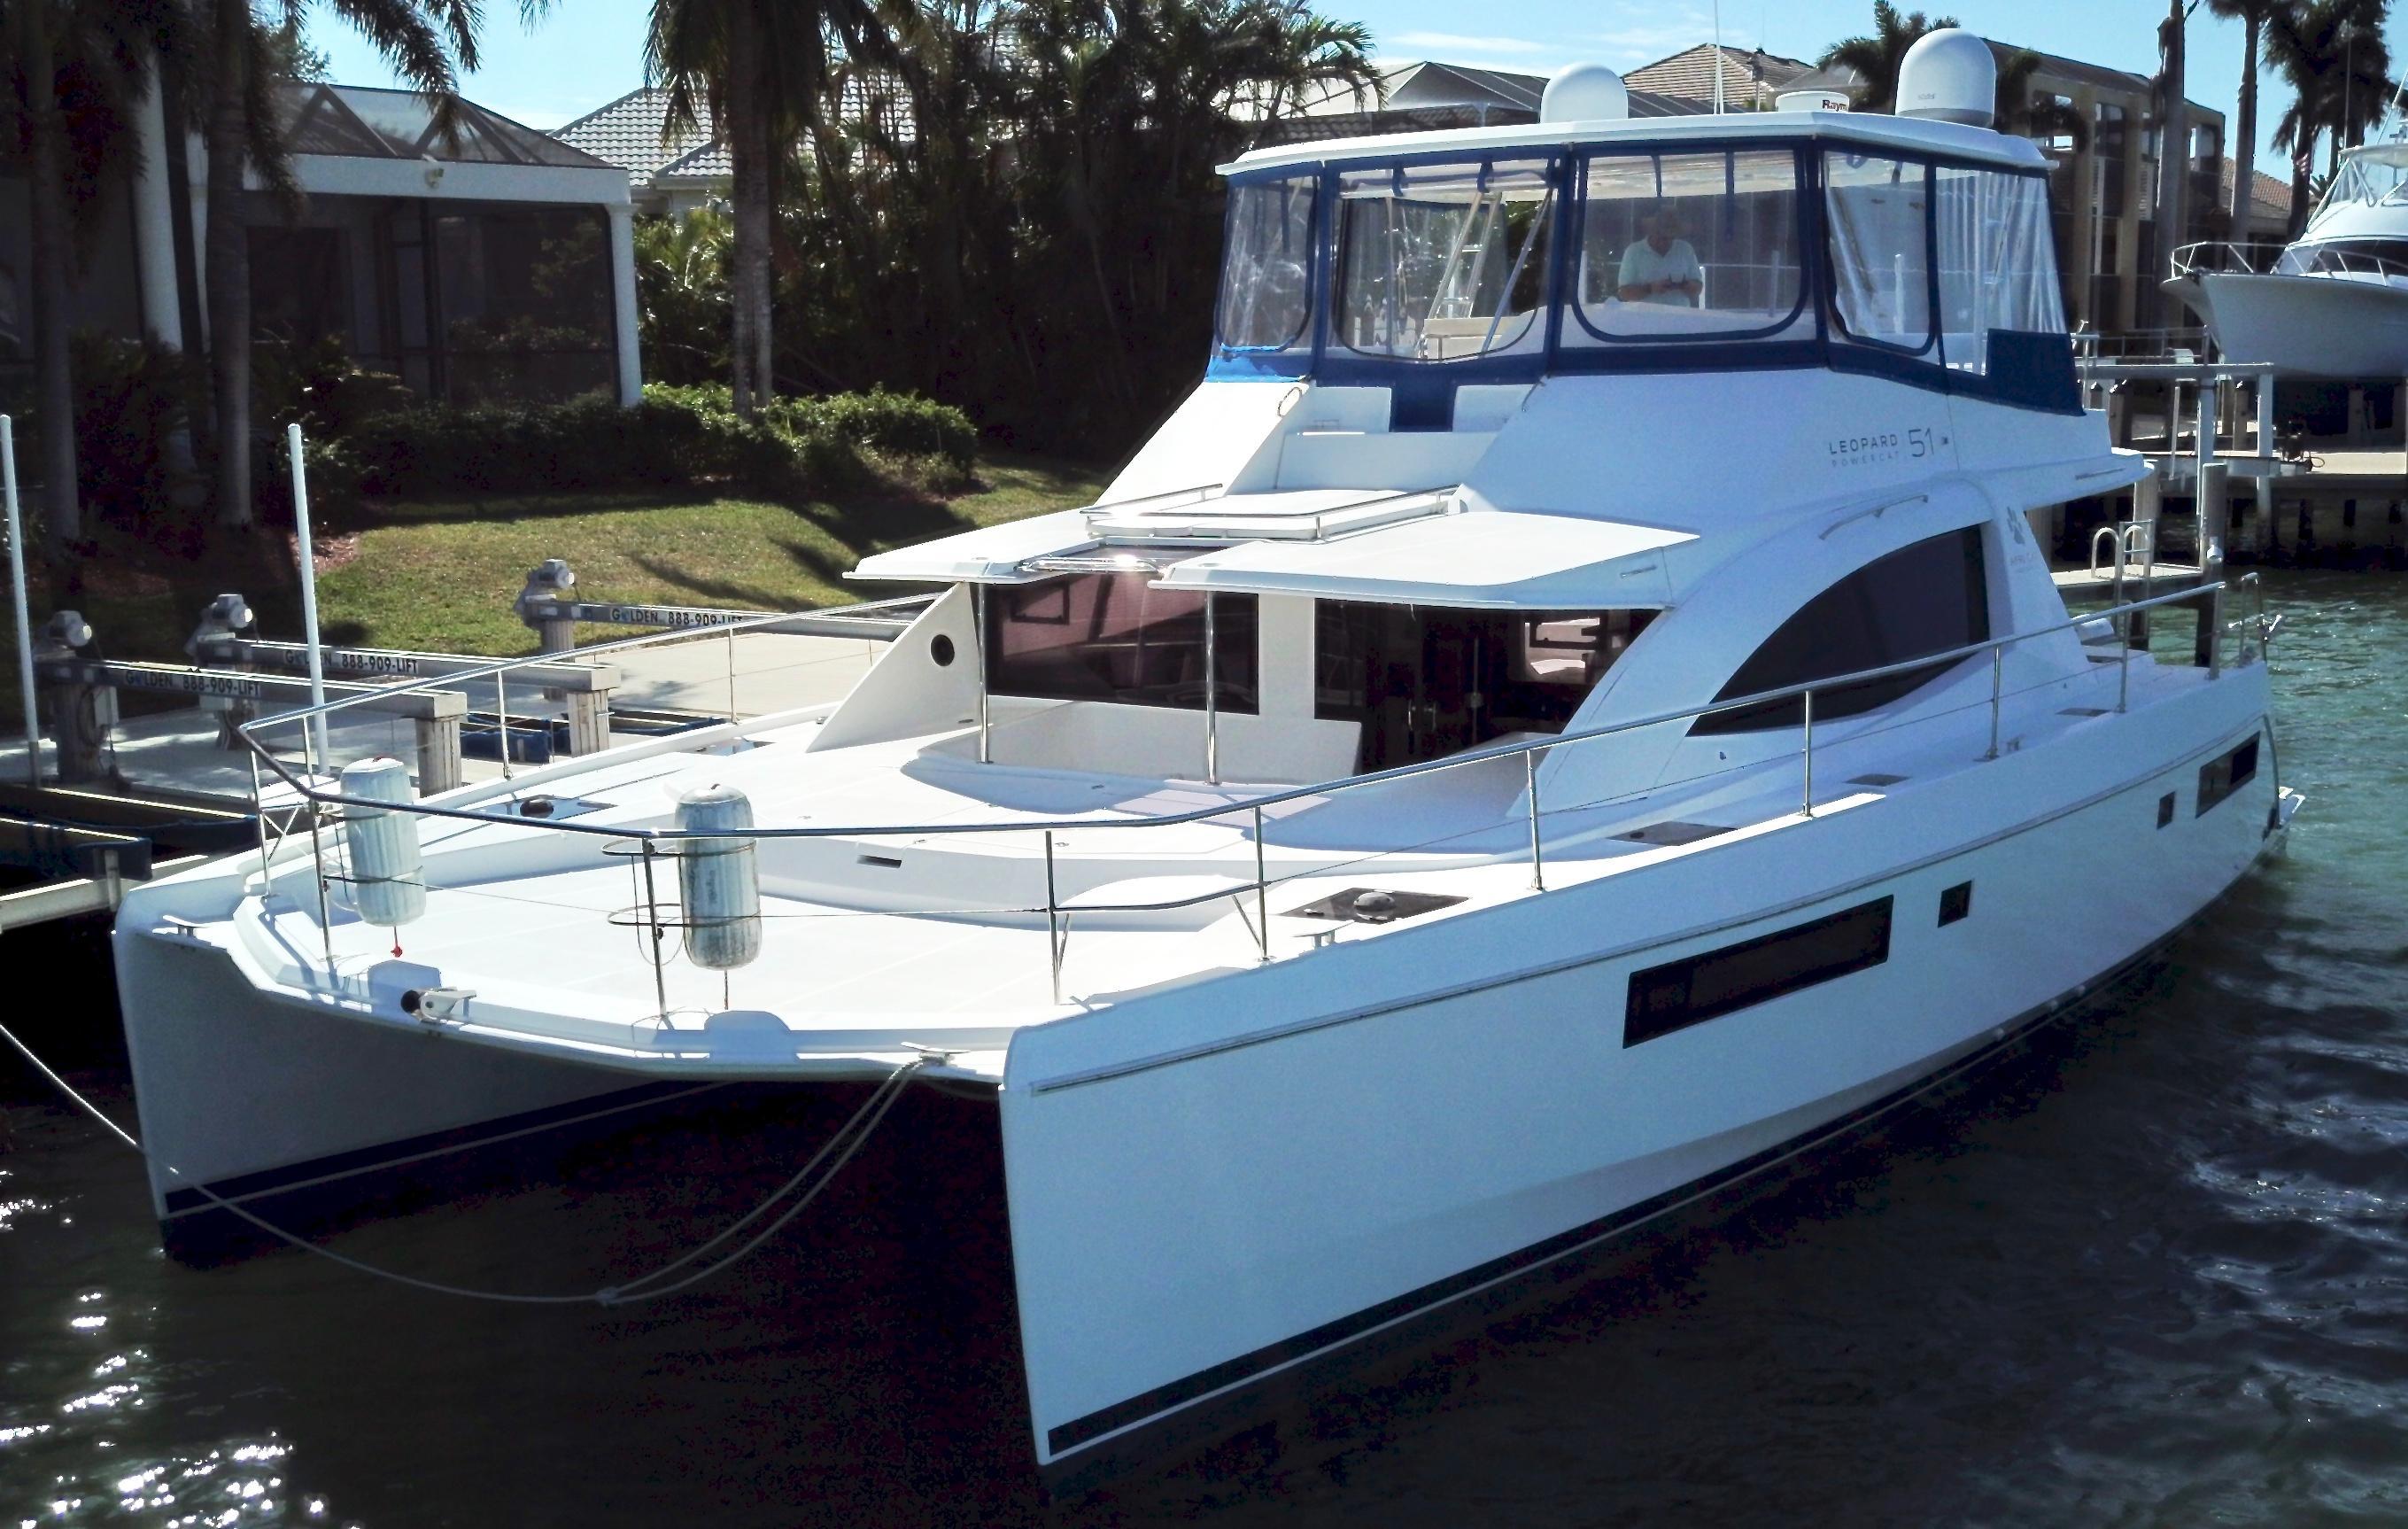 antithesis yacht marco island Antithesis coming about upnorthwoods loading megayacht - concept luxury yacht ⋆ billionaires club ⋆ luxury ⋆ - duration: 2:12.